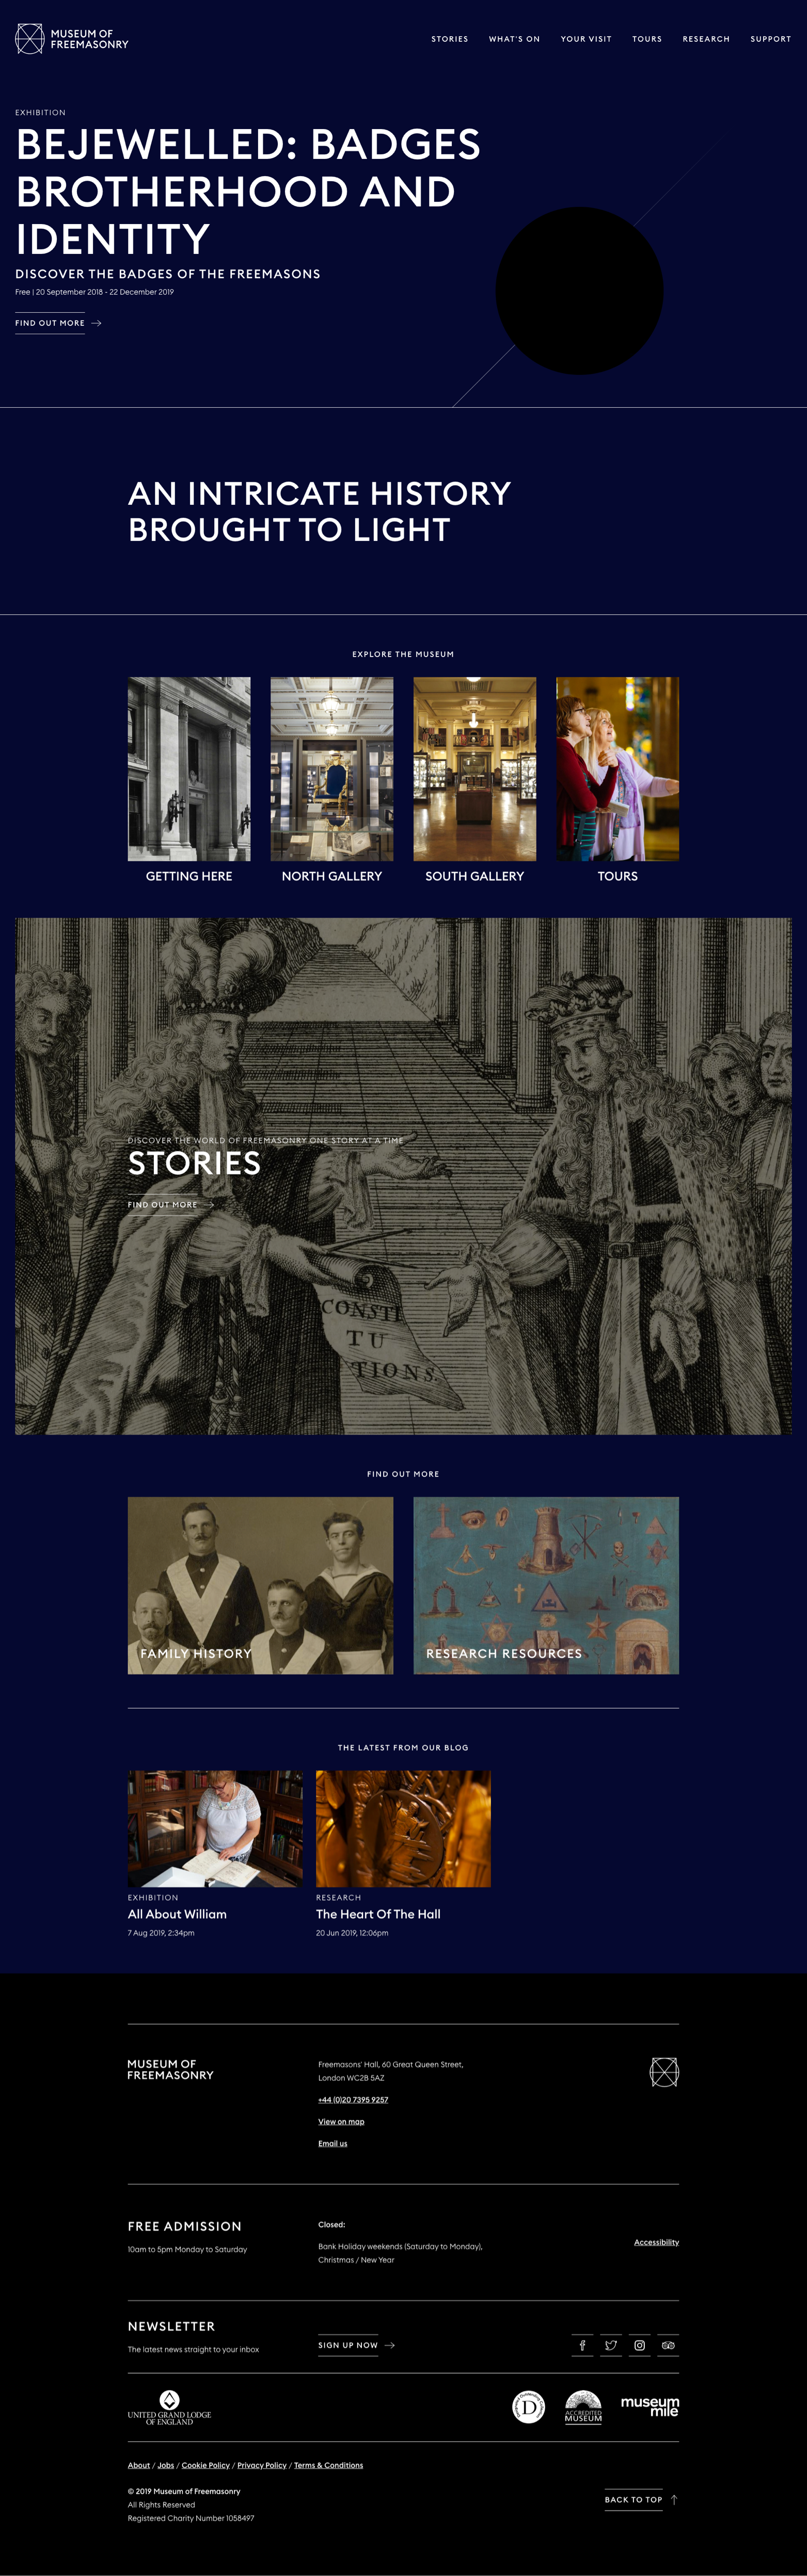 The full Museum of Freemasonry website